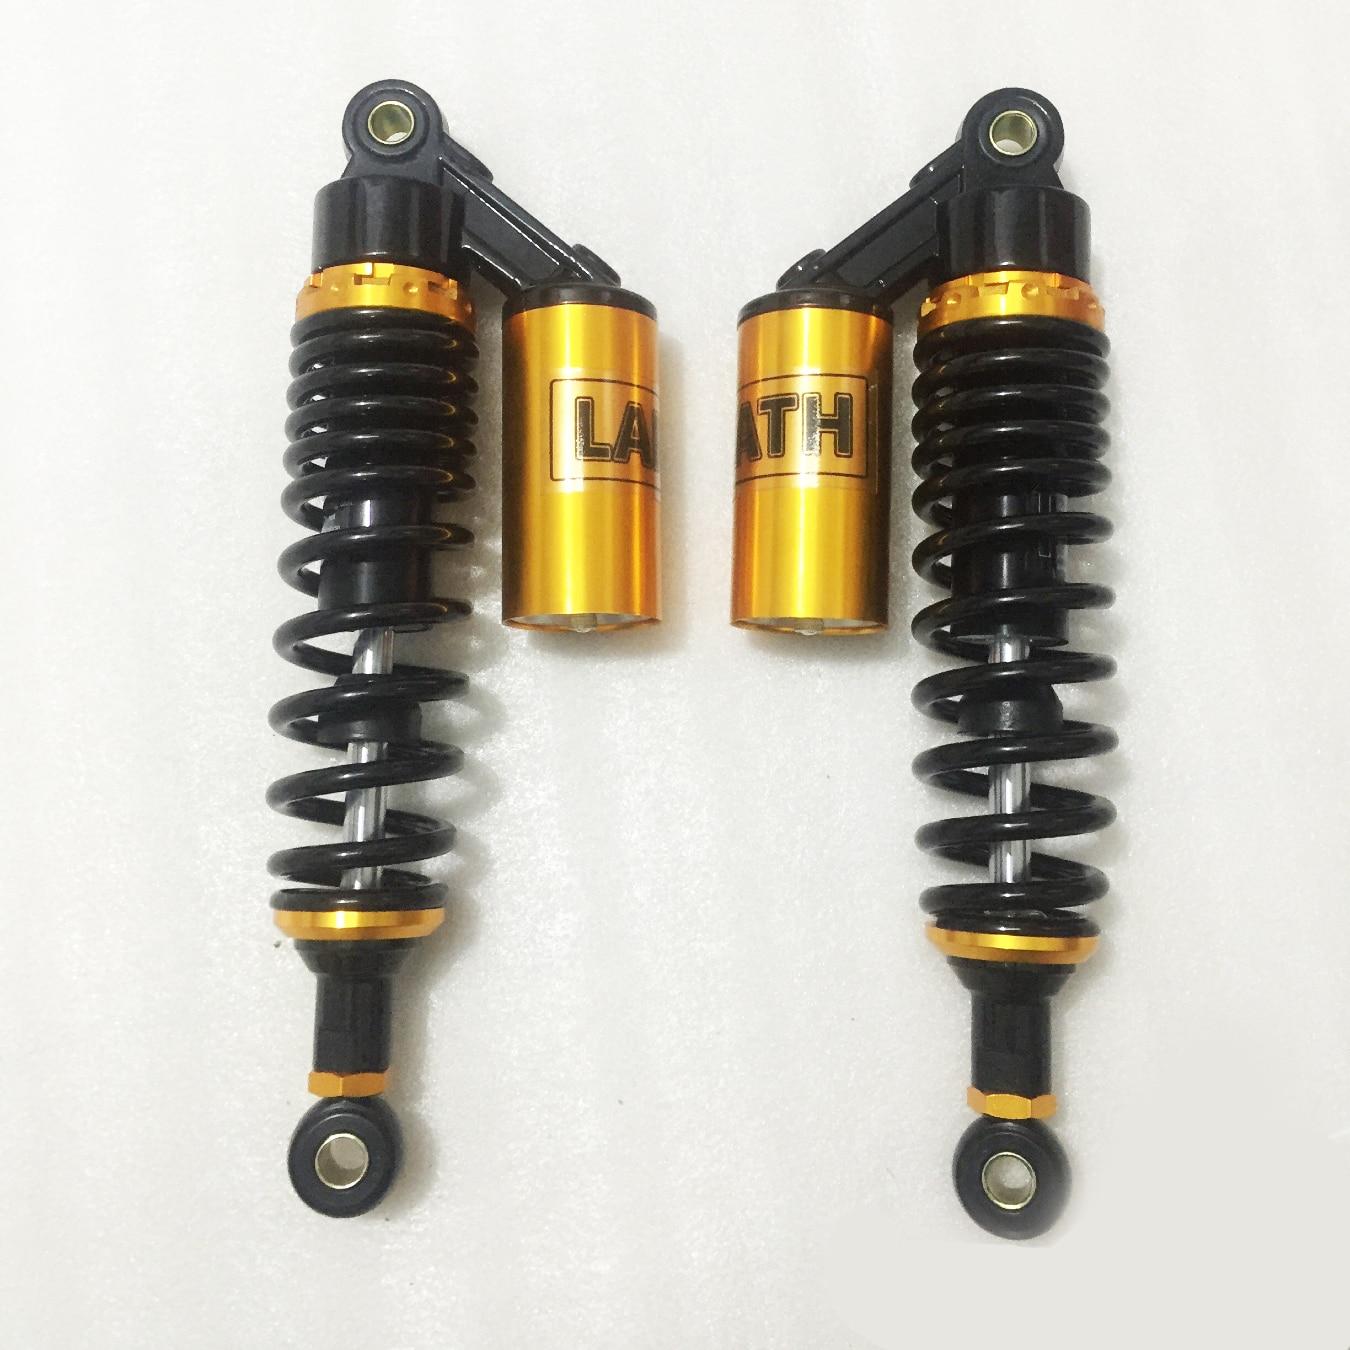 320mm 330mm 340mm Motorcycle Air Shock Absorber for HONDA SUZUKI YAMAHA cx500 xjr400 GSX750 CB400 TRX250R 450R 400ER 1 set yellow 320mm motorcycle air shock absorbers for honda trx250r 450r 400er quad atv rfy